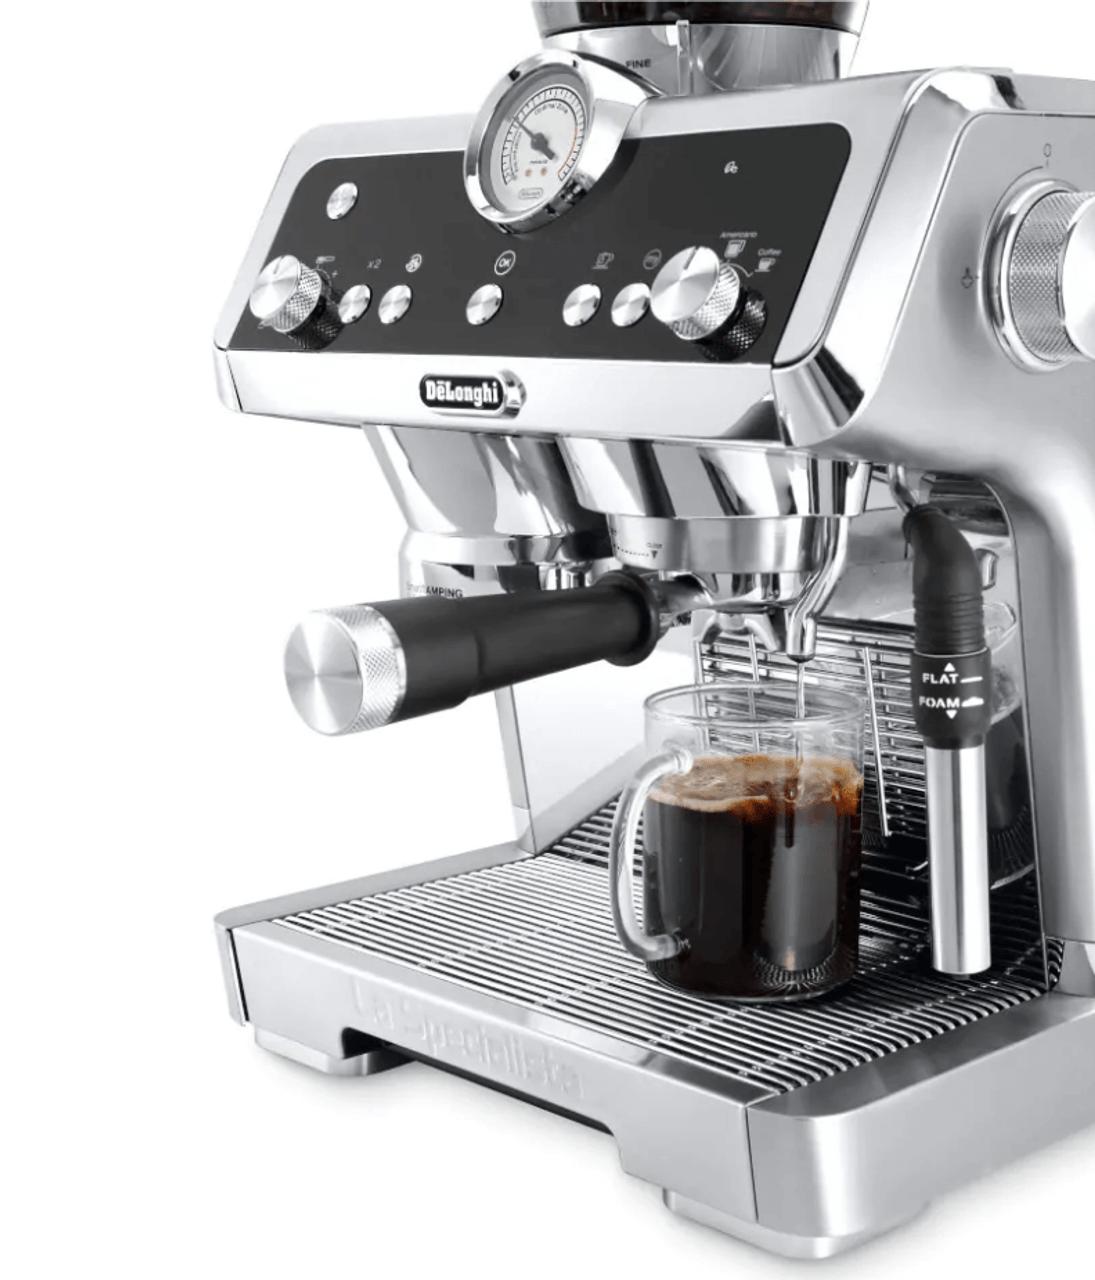 DeLonghi La Specialista Manual Coffee Machine EC9335M